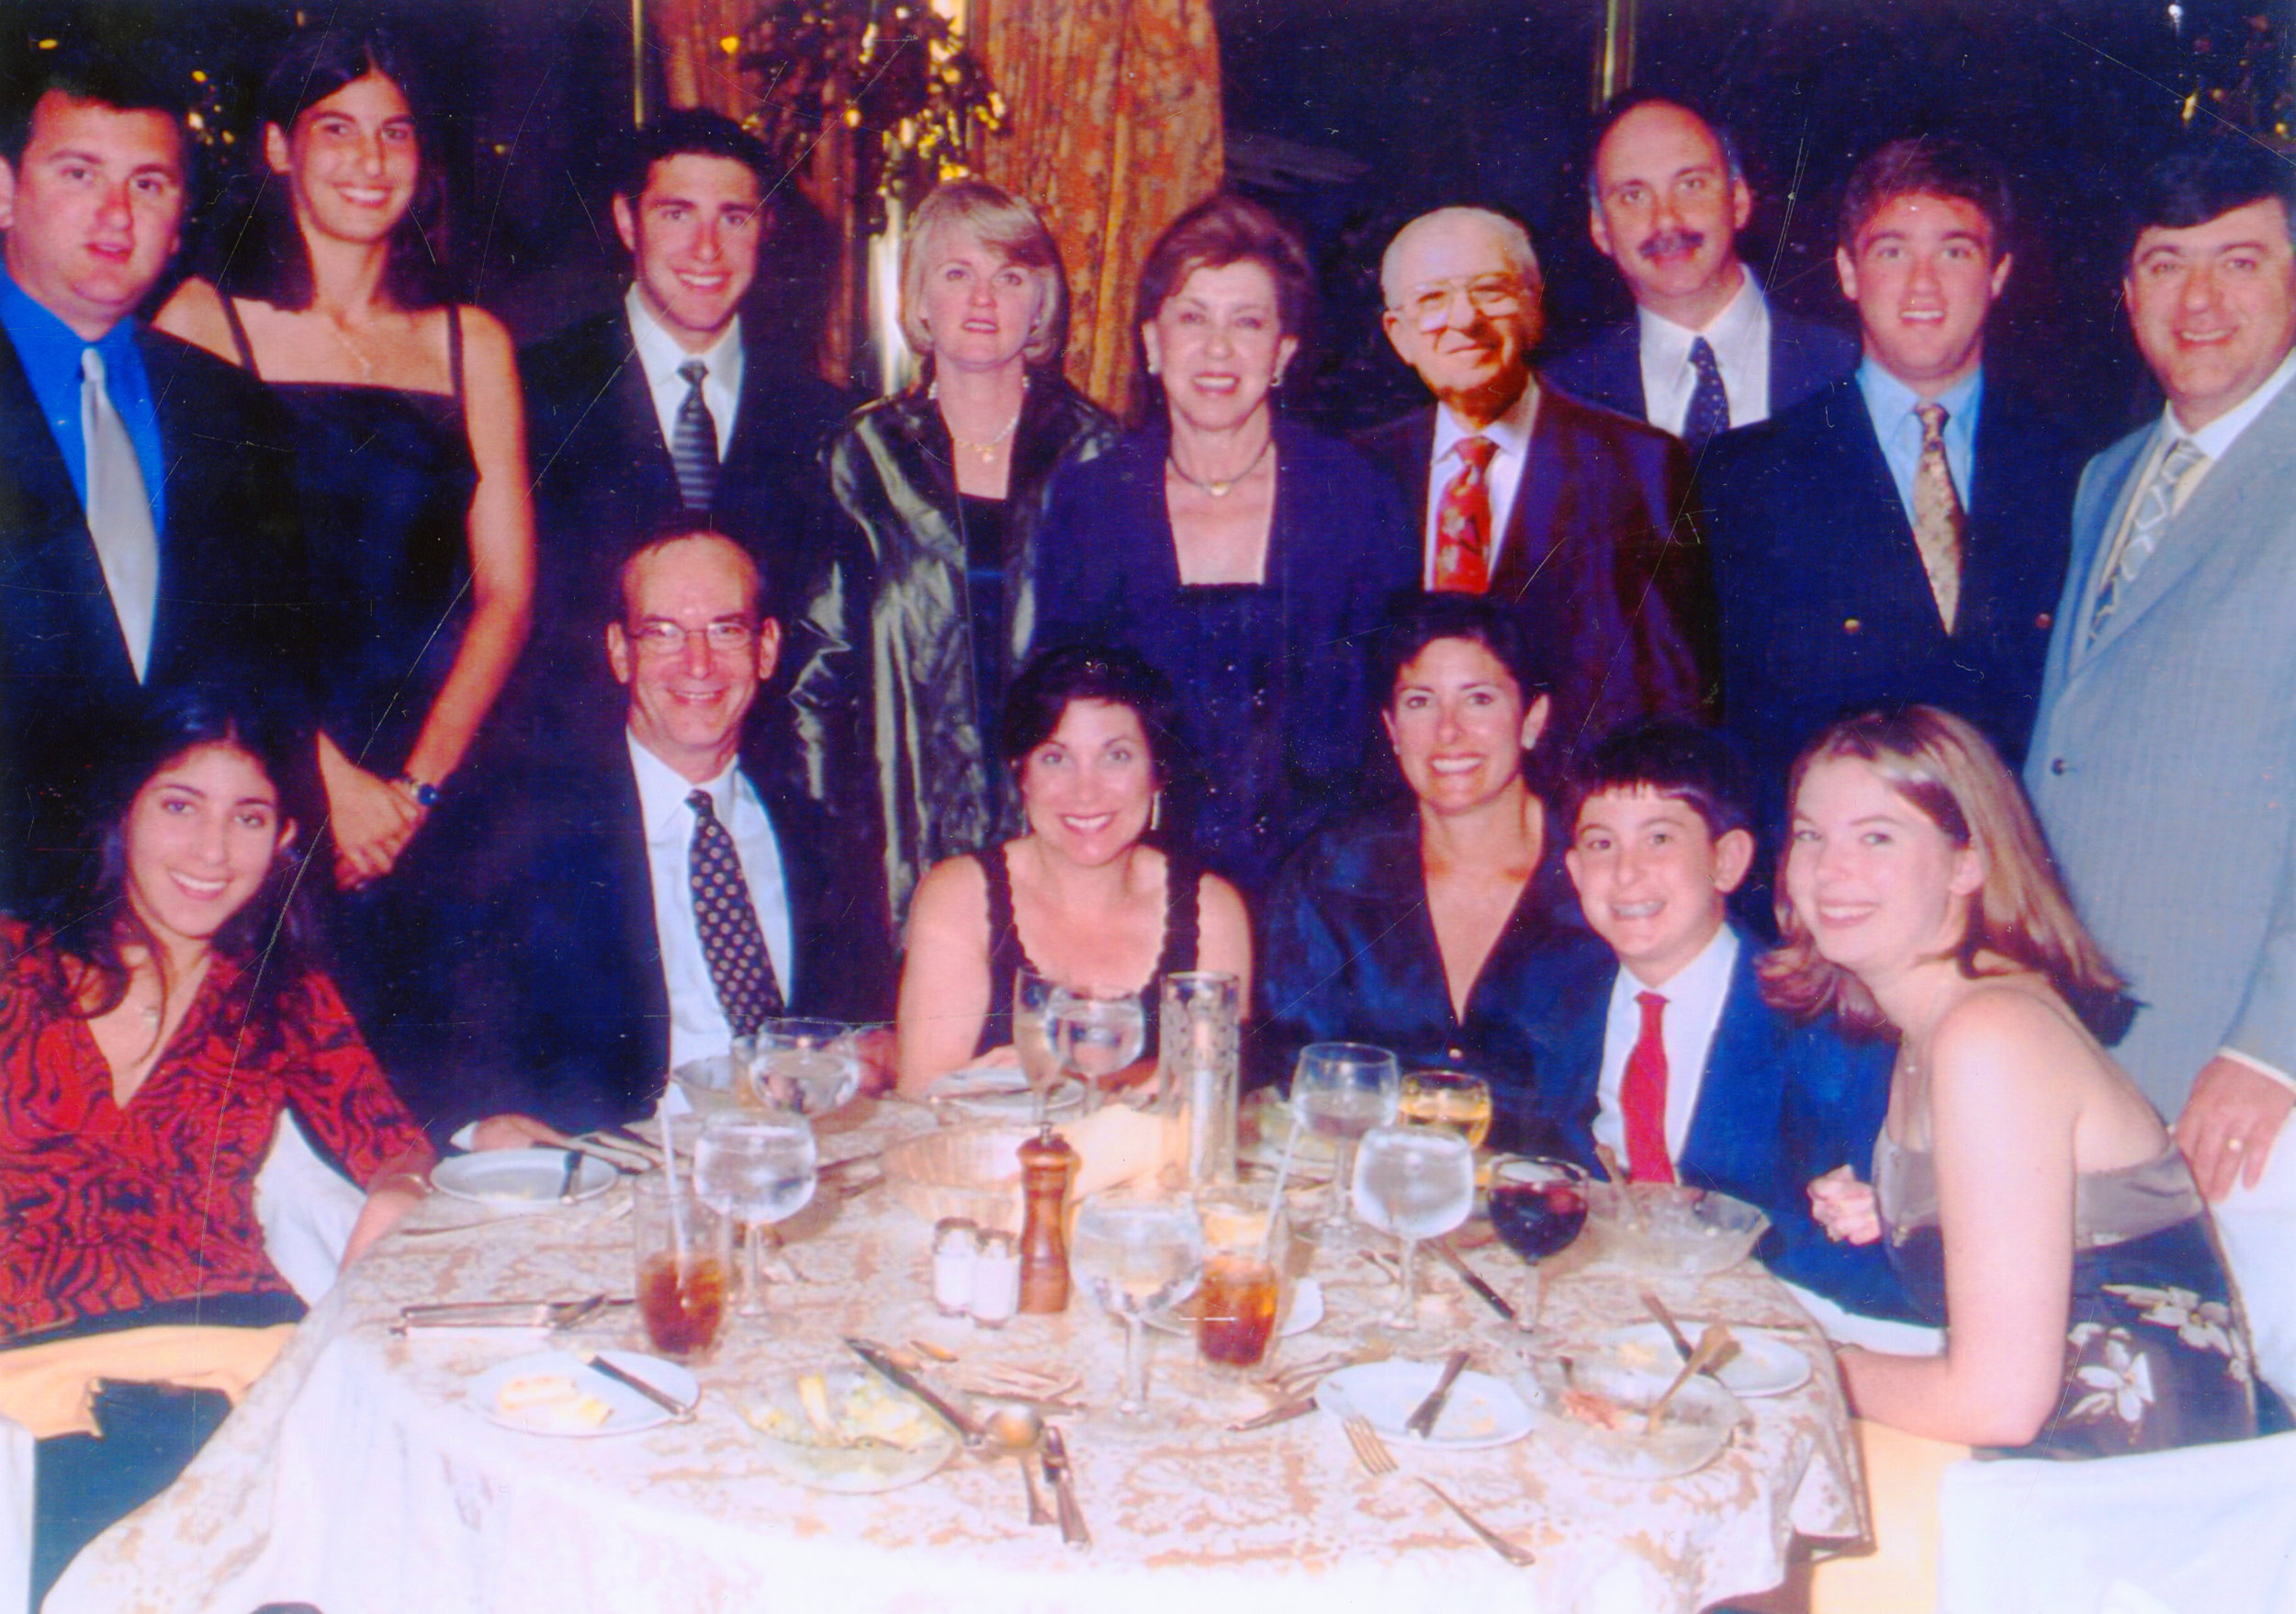 The Goldberg family. Image courtesy Esther Goldberg Greenberg